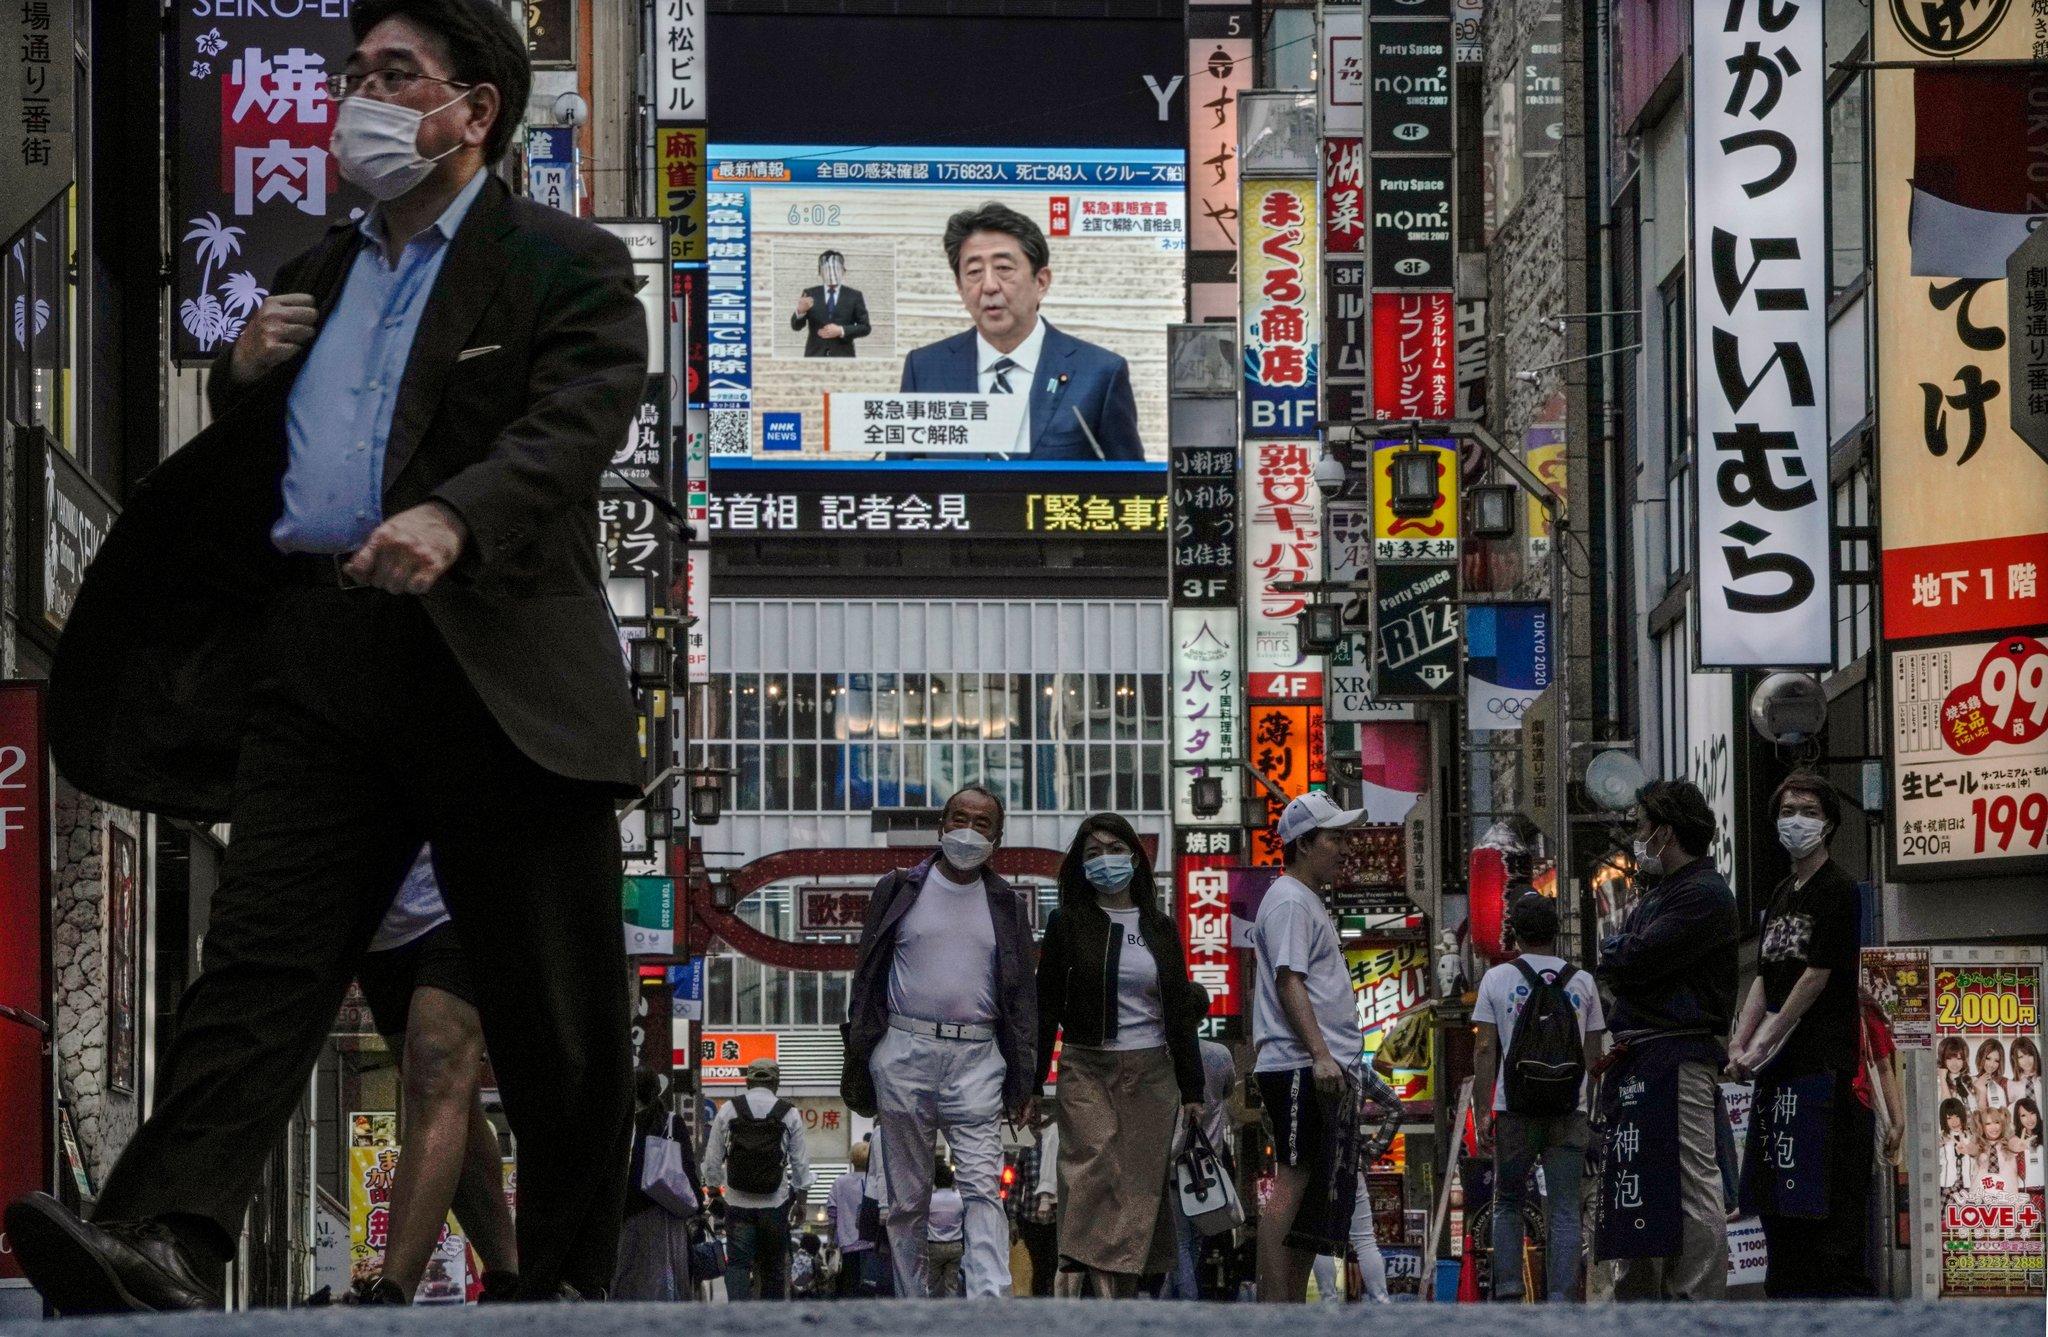 Quận Kabukicho, Tokyo hồi tháng 5/2020. Ảnh: EPA